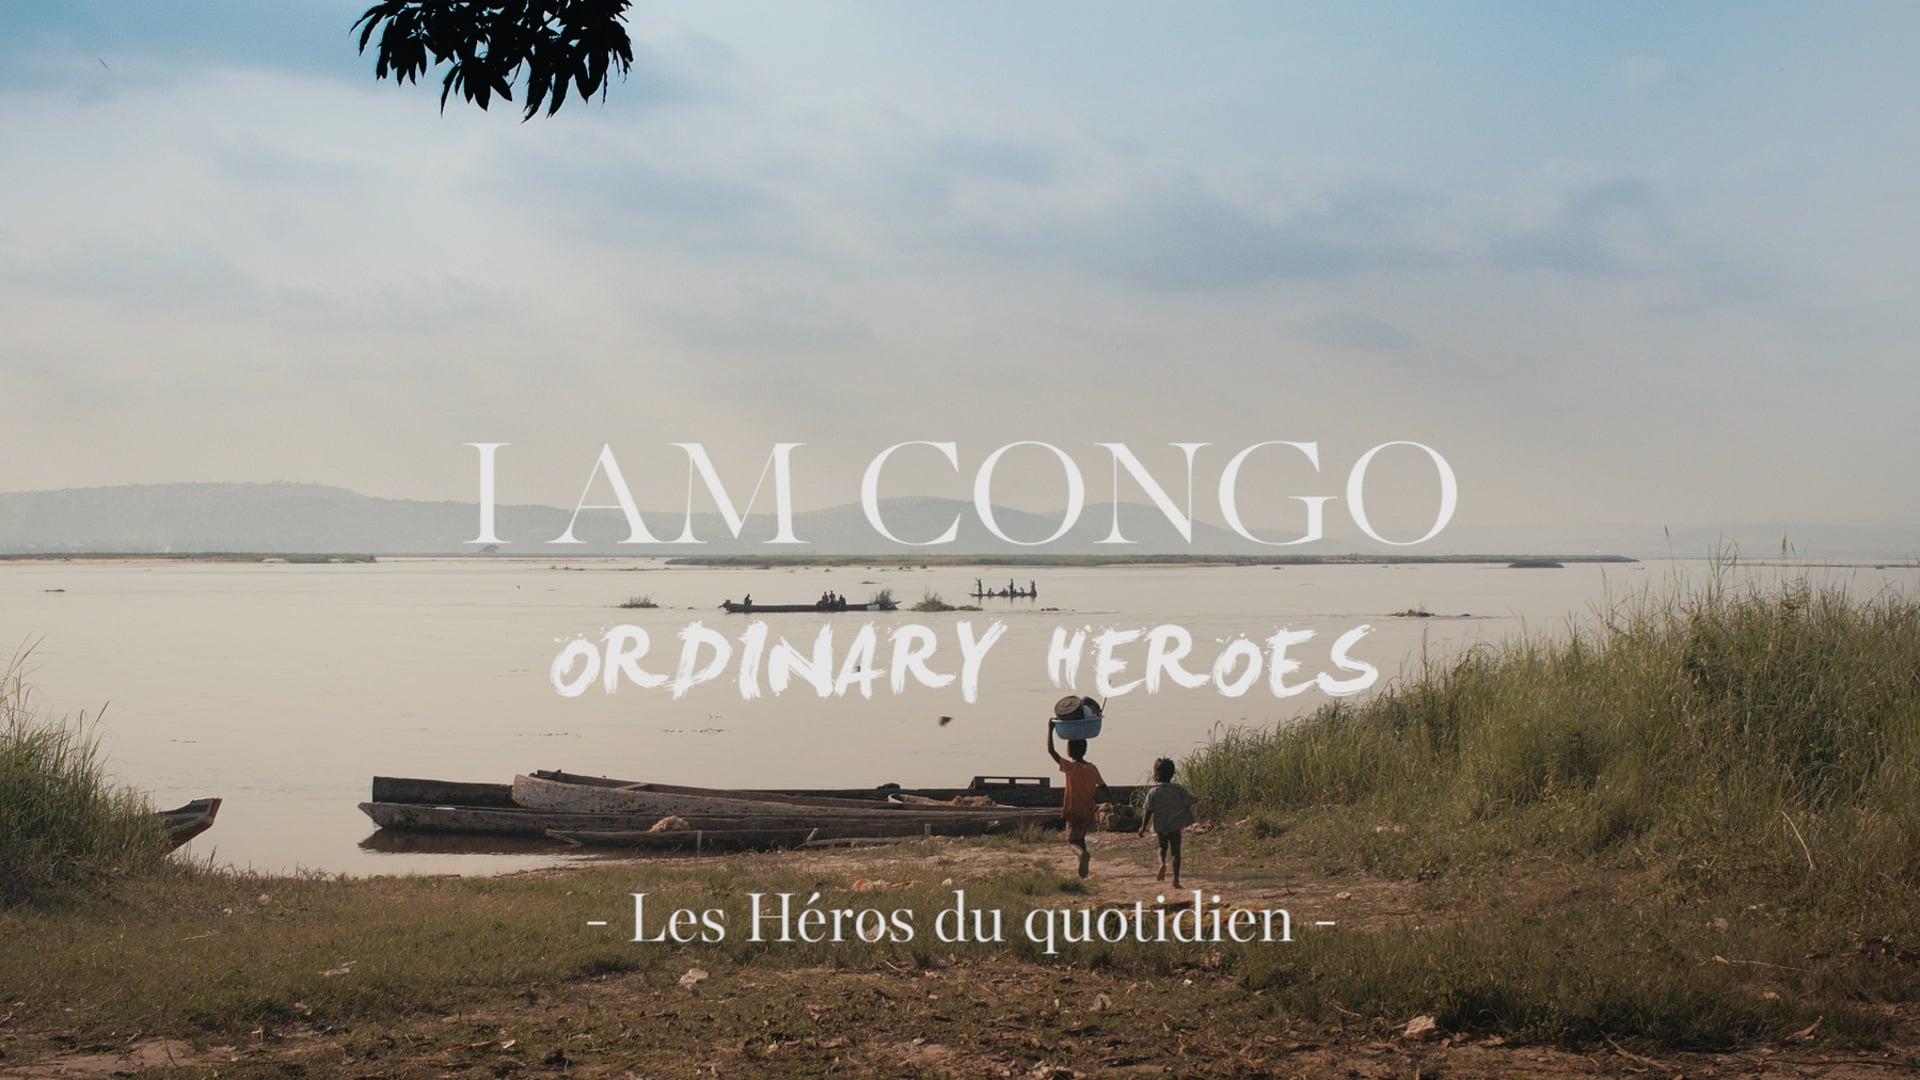 Ordinary Heroes Ep.4